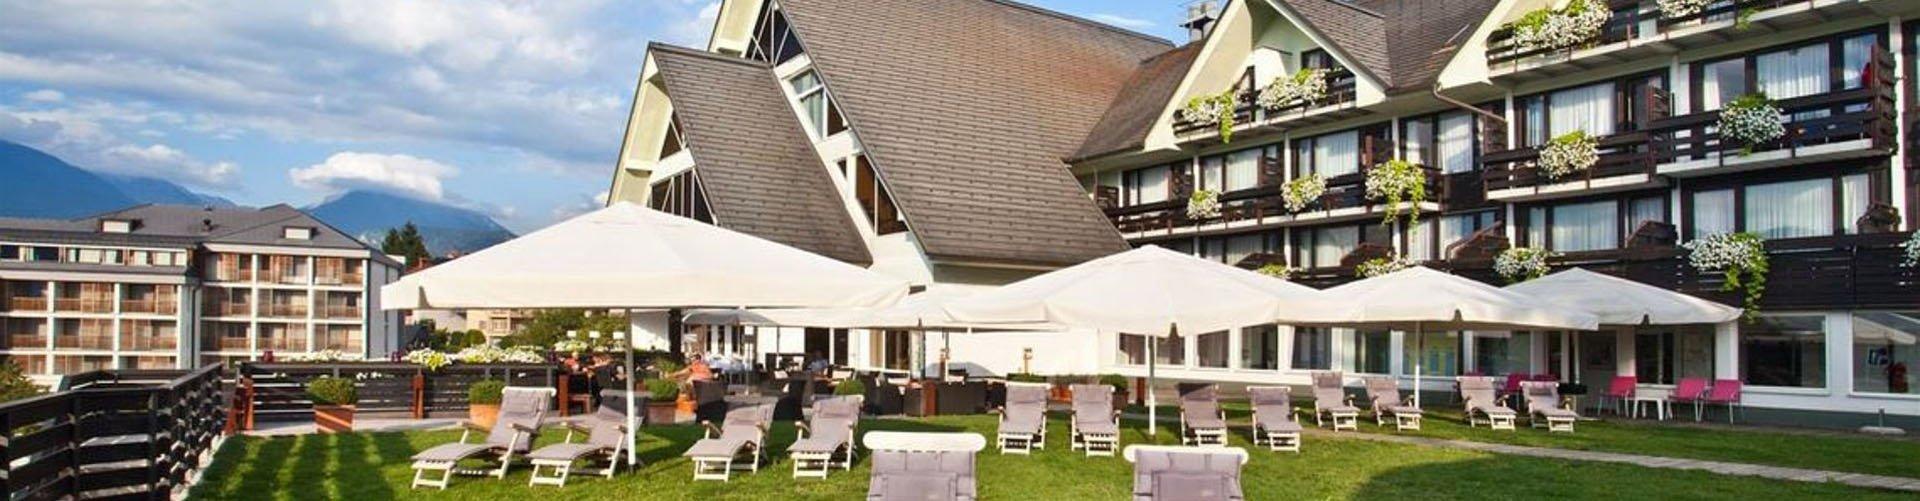 Banner Hotel Kompas Bled, Slovenië